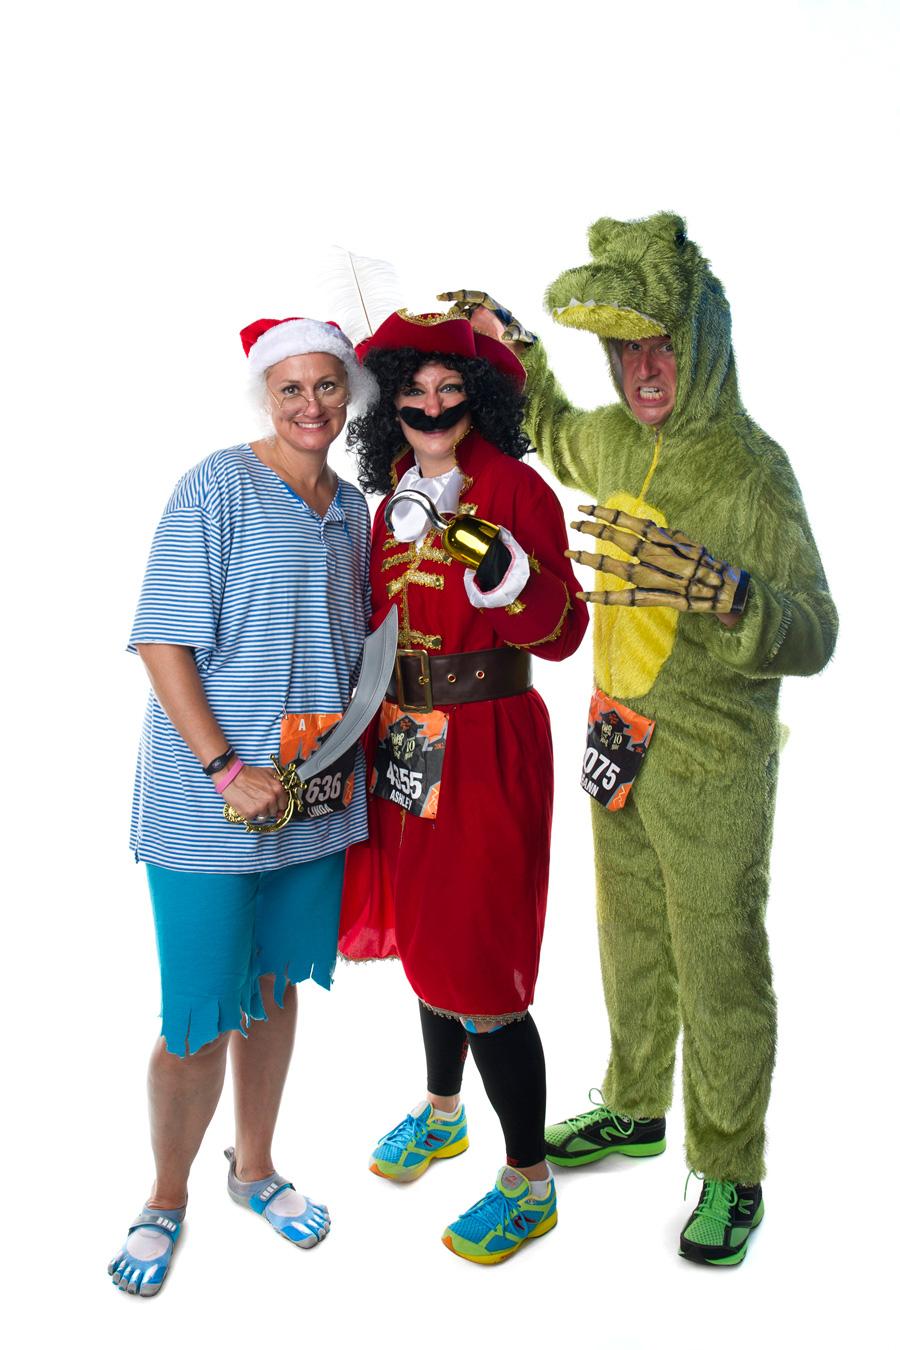 disney parks vote for the best rundisney halloween costume